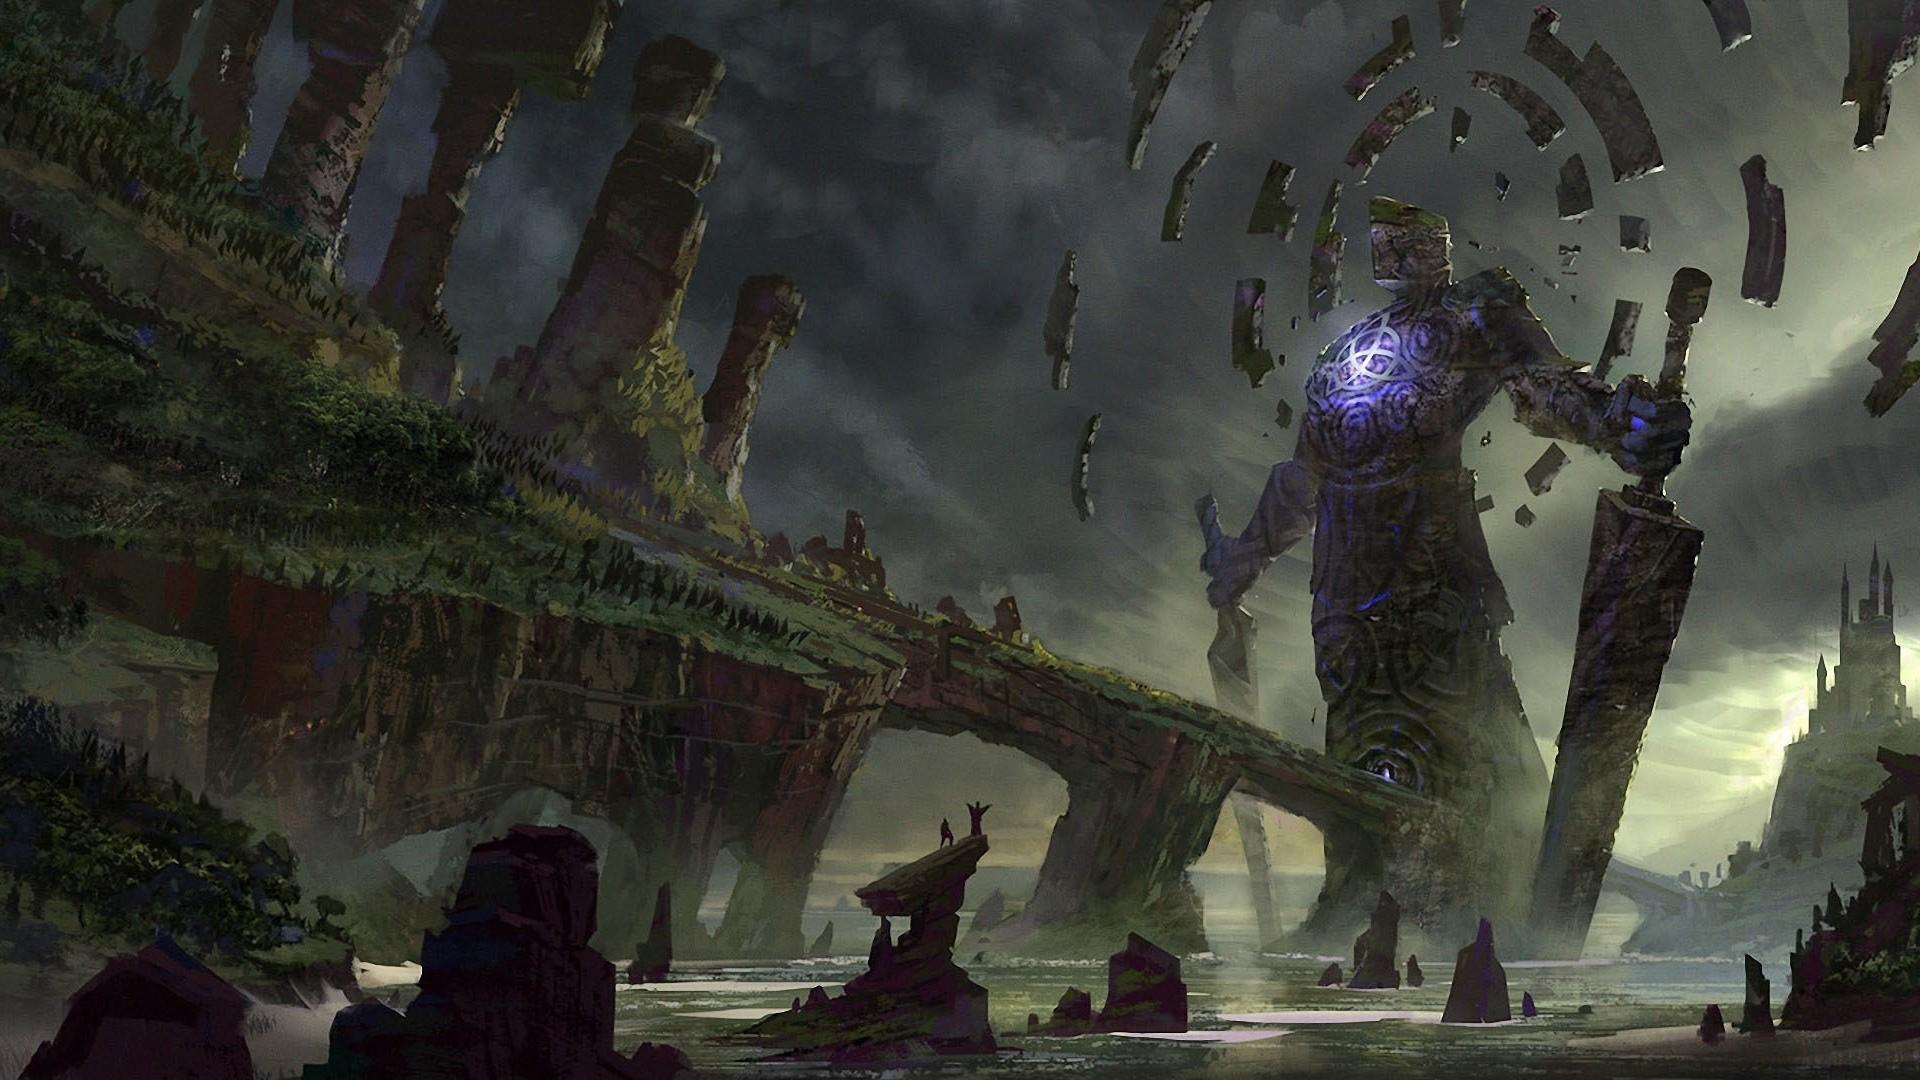 General 1920x1080 colossus fantasy art landscape artwork digital art video games Shadow of the Colossus